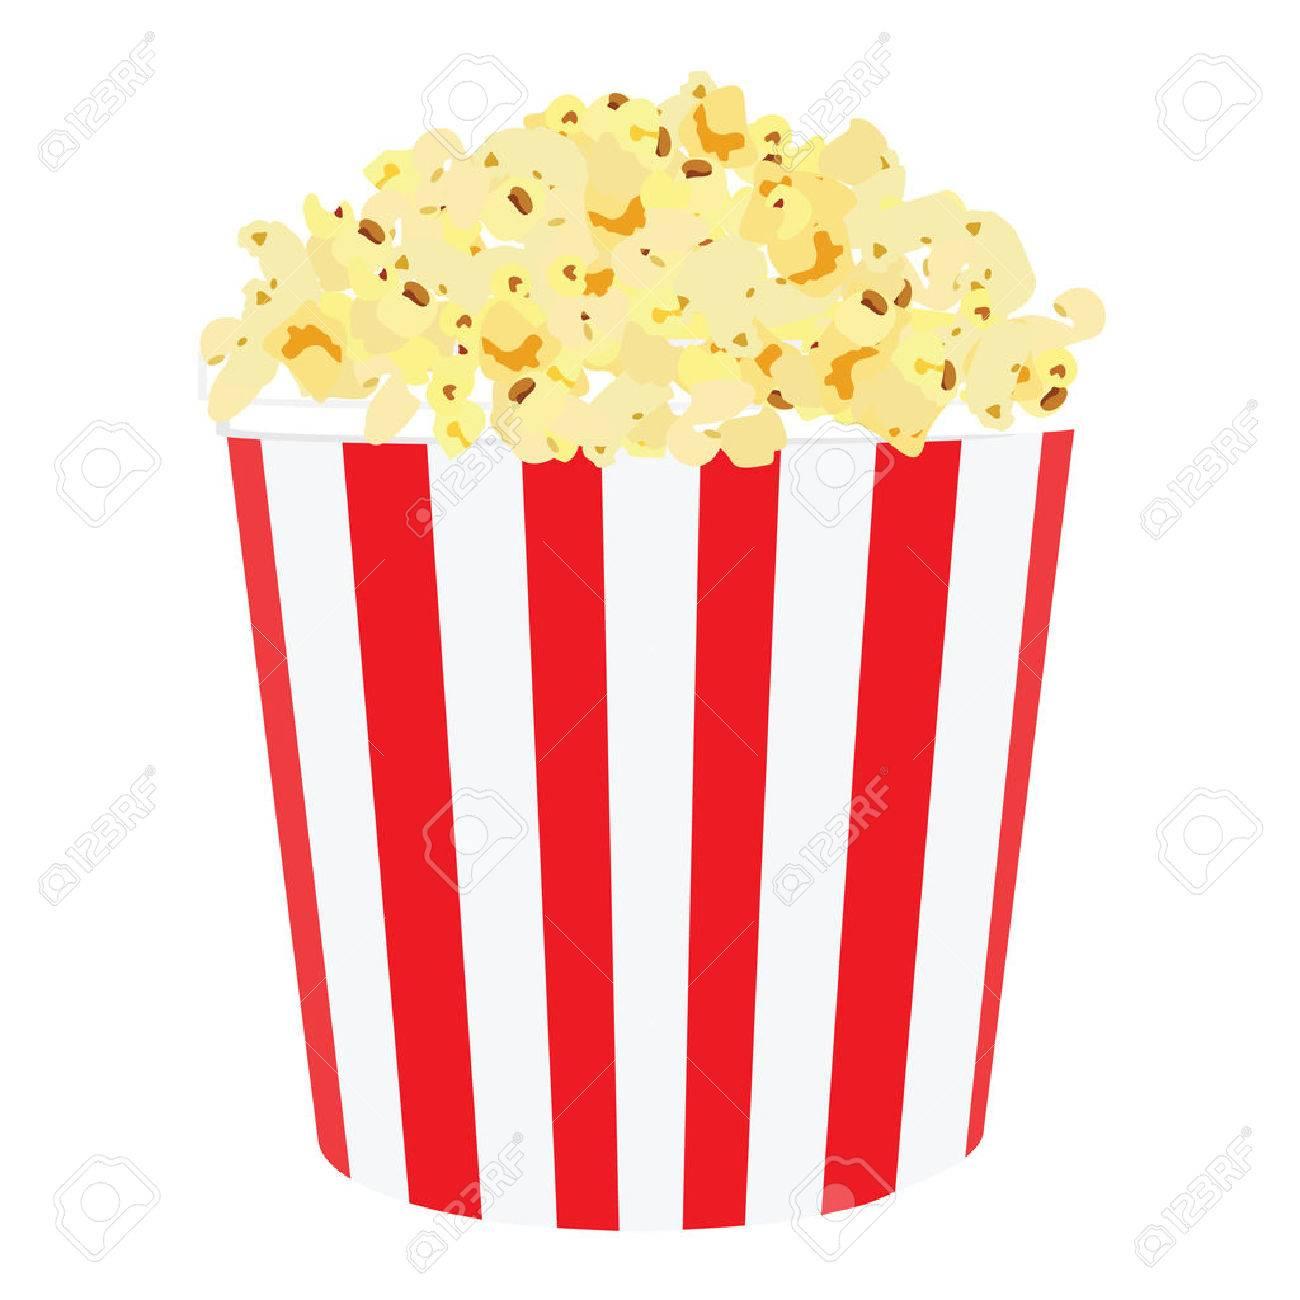 Vector illustration of movie popcorn. Popcorn in red and white striped box. Popcorn box. Paper bag with popcorn - 44108978